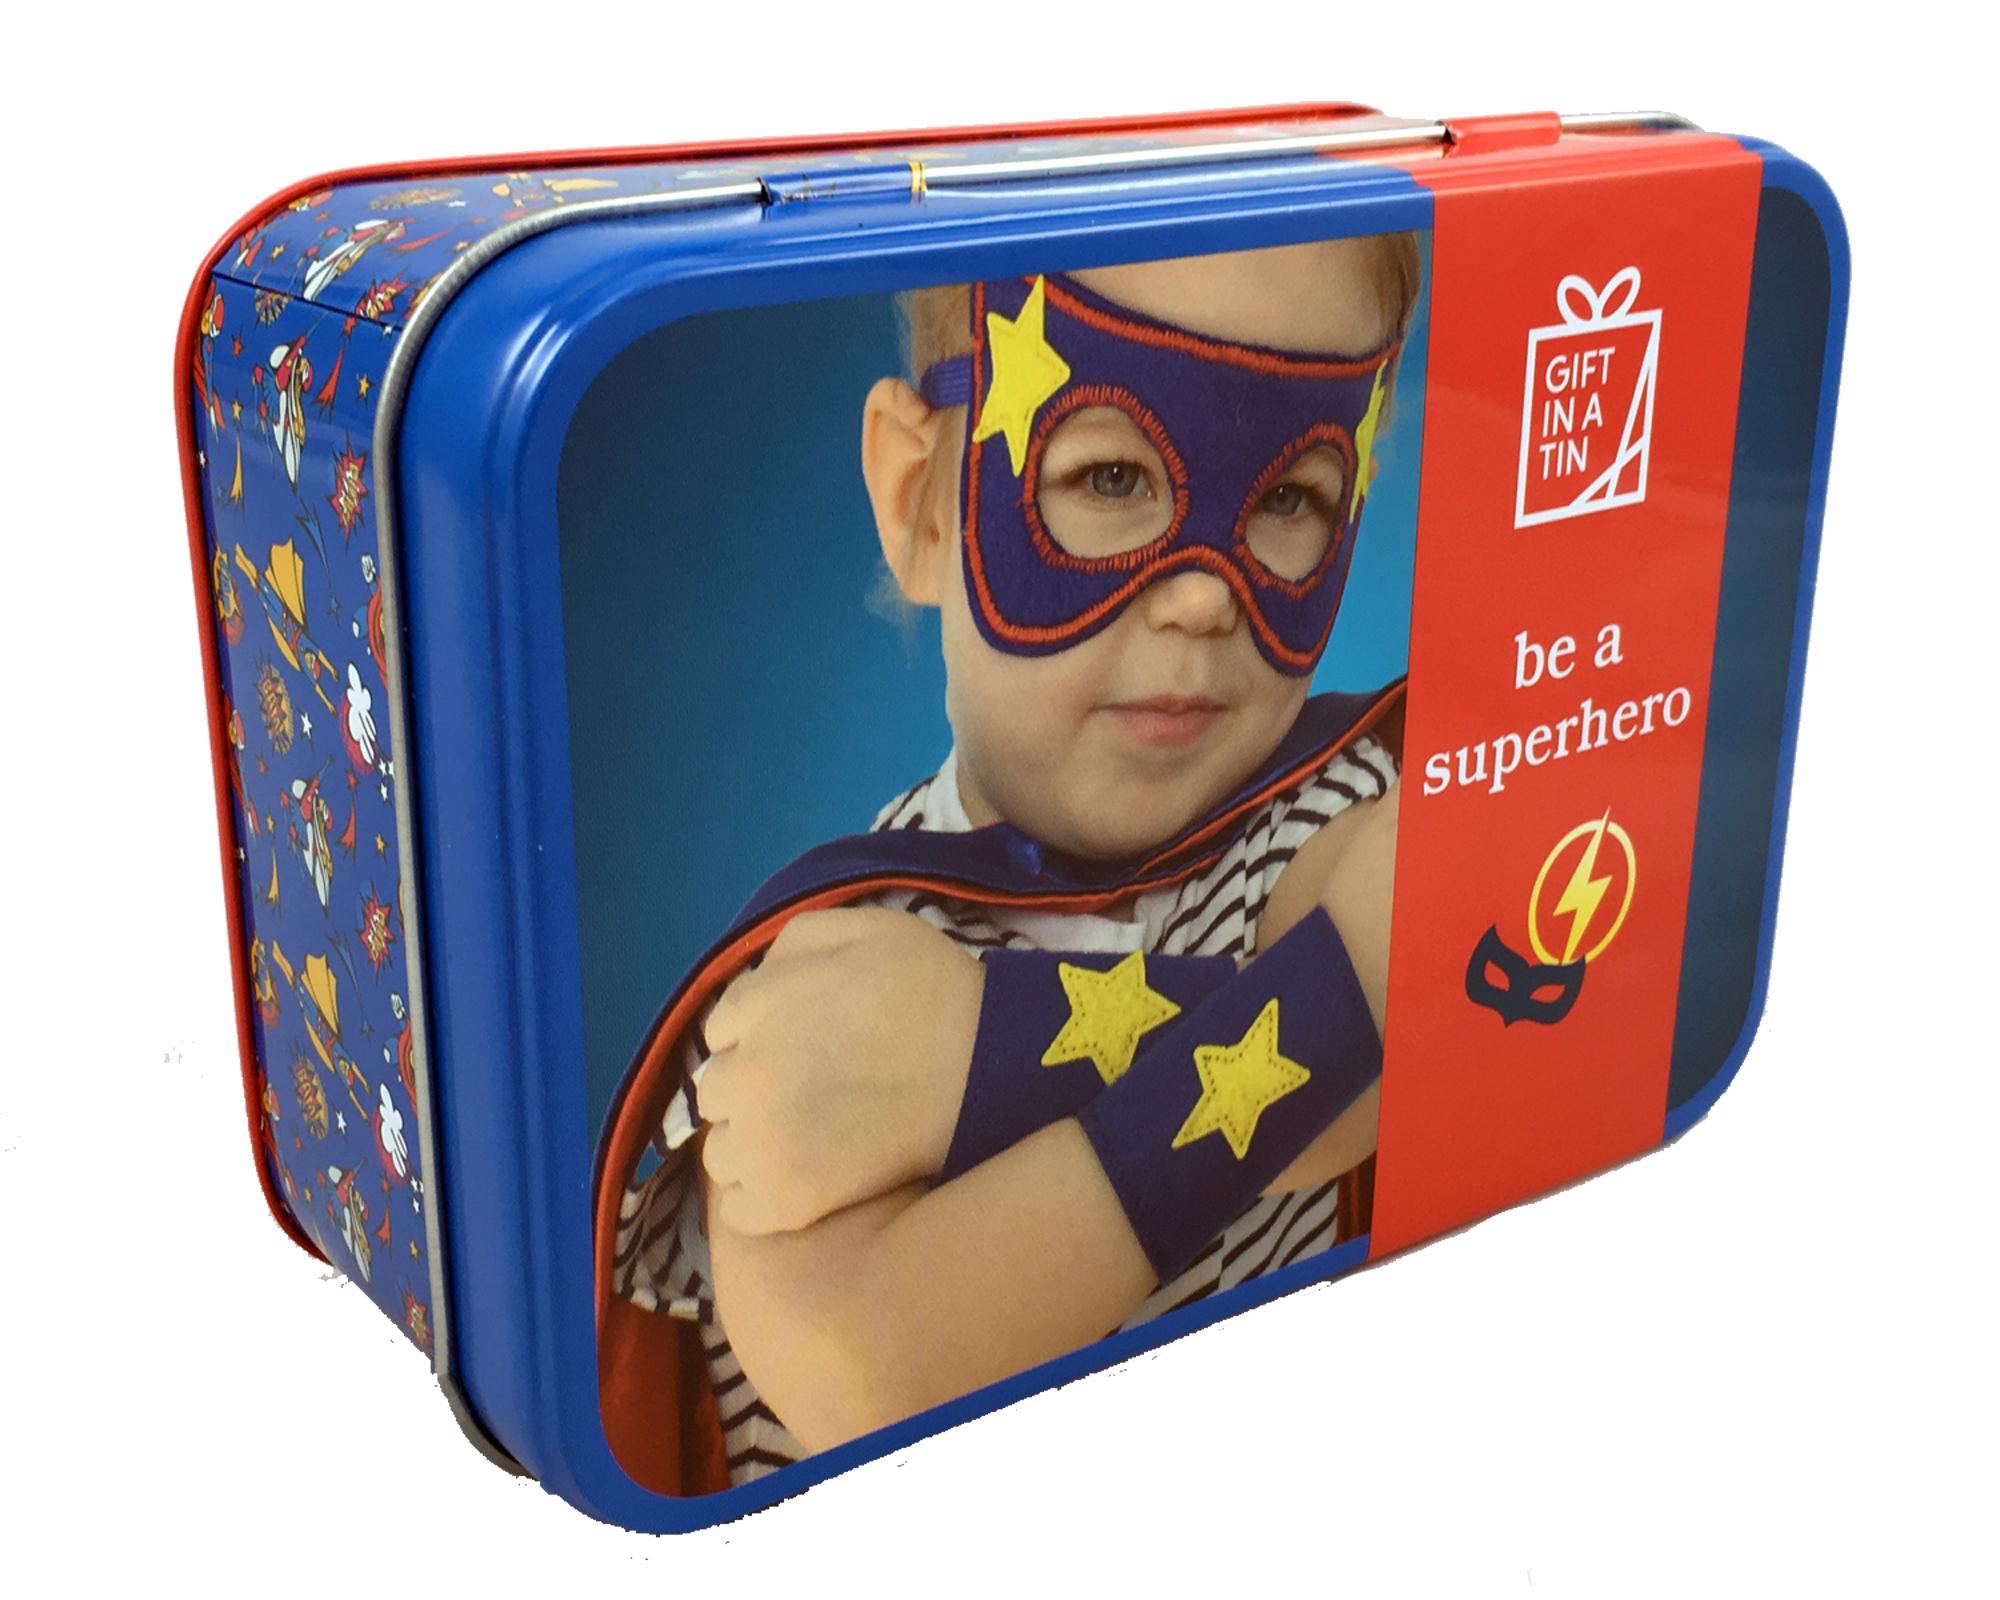 Imagen de Lata para ser un super héroe o super heroína